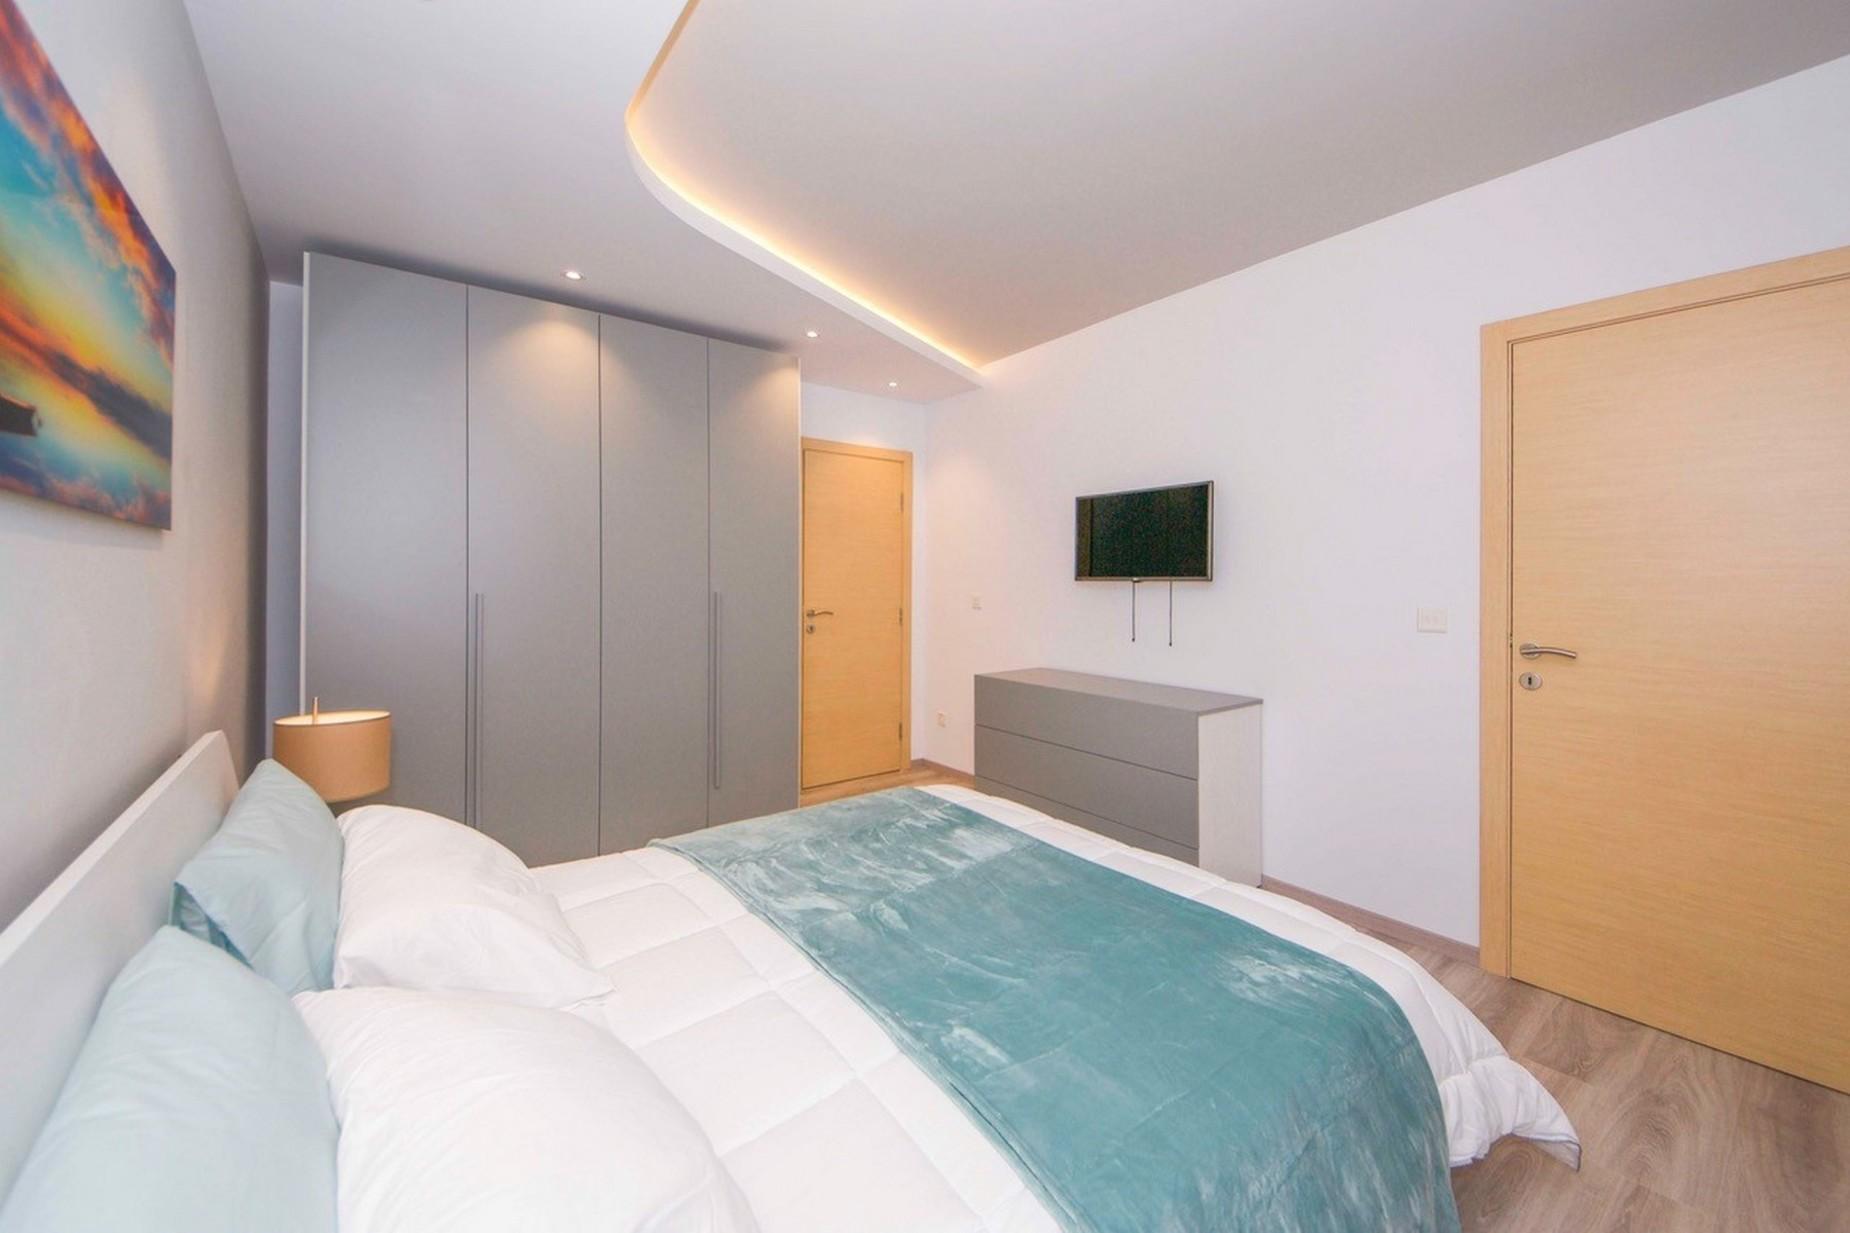 2 bed Apartment For Rent in Qawra, Qawra - thumb 12